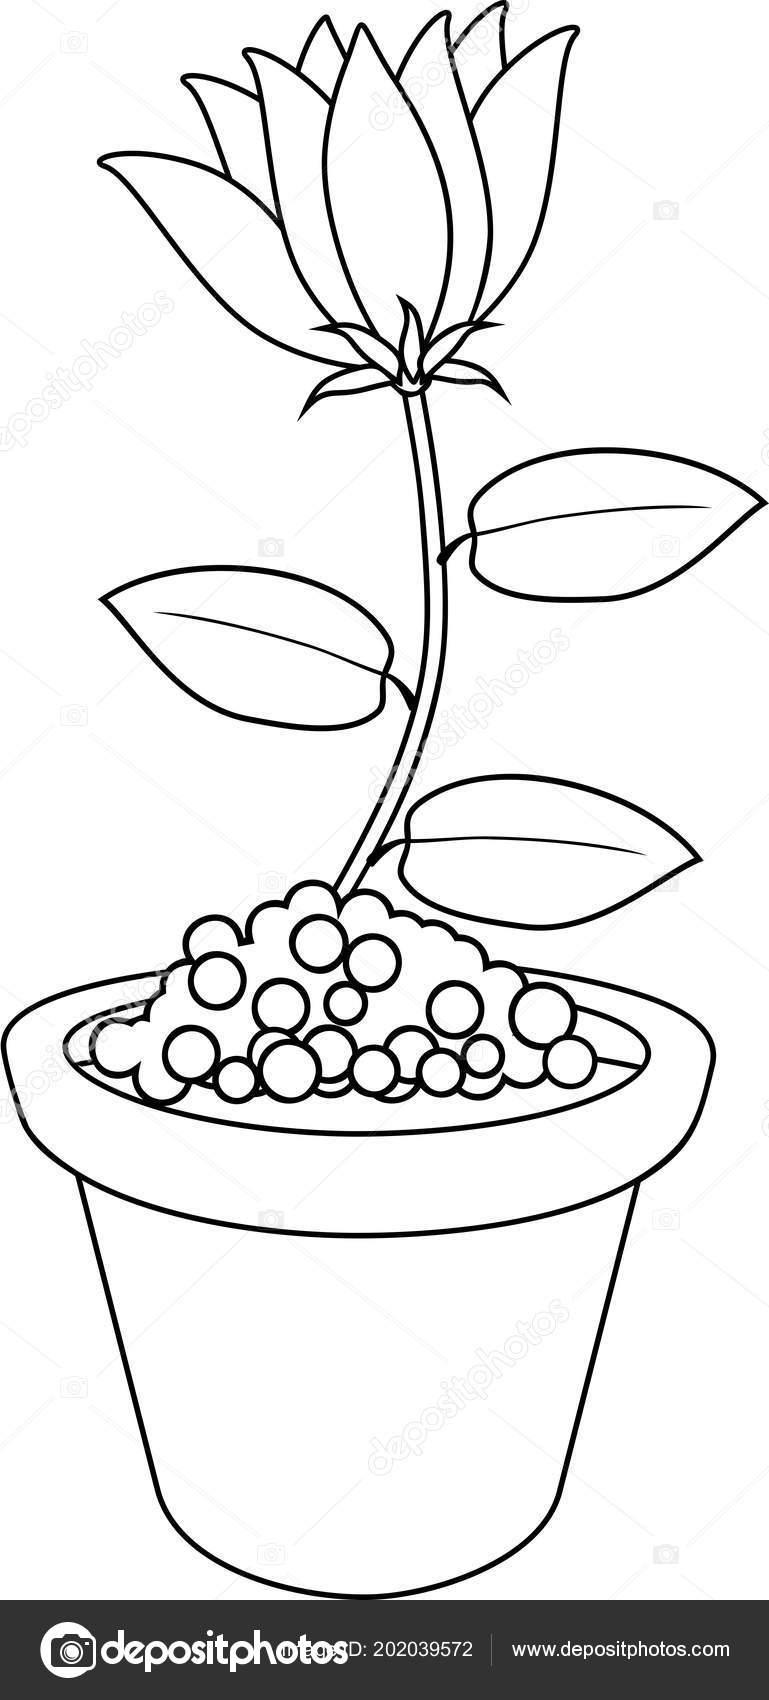 Coloriage Fleur Pot.Coloriage Fleurs Pot Fleurs Image Vectorielle Mariaflaya C 202039572